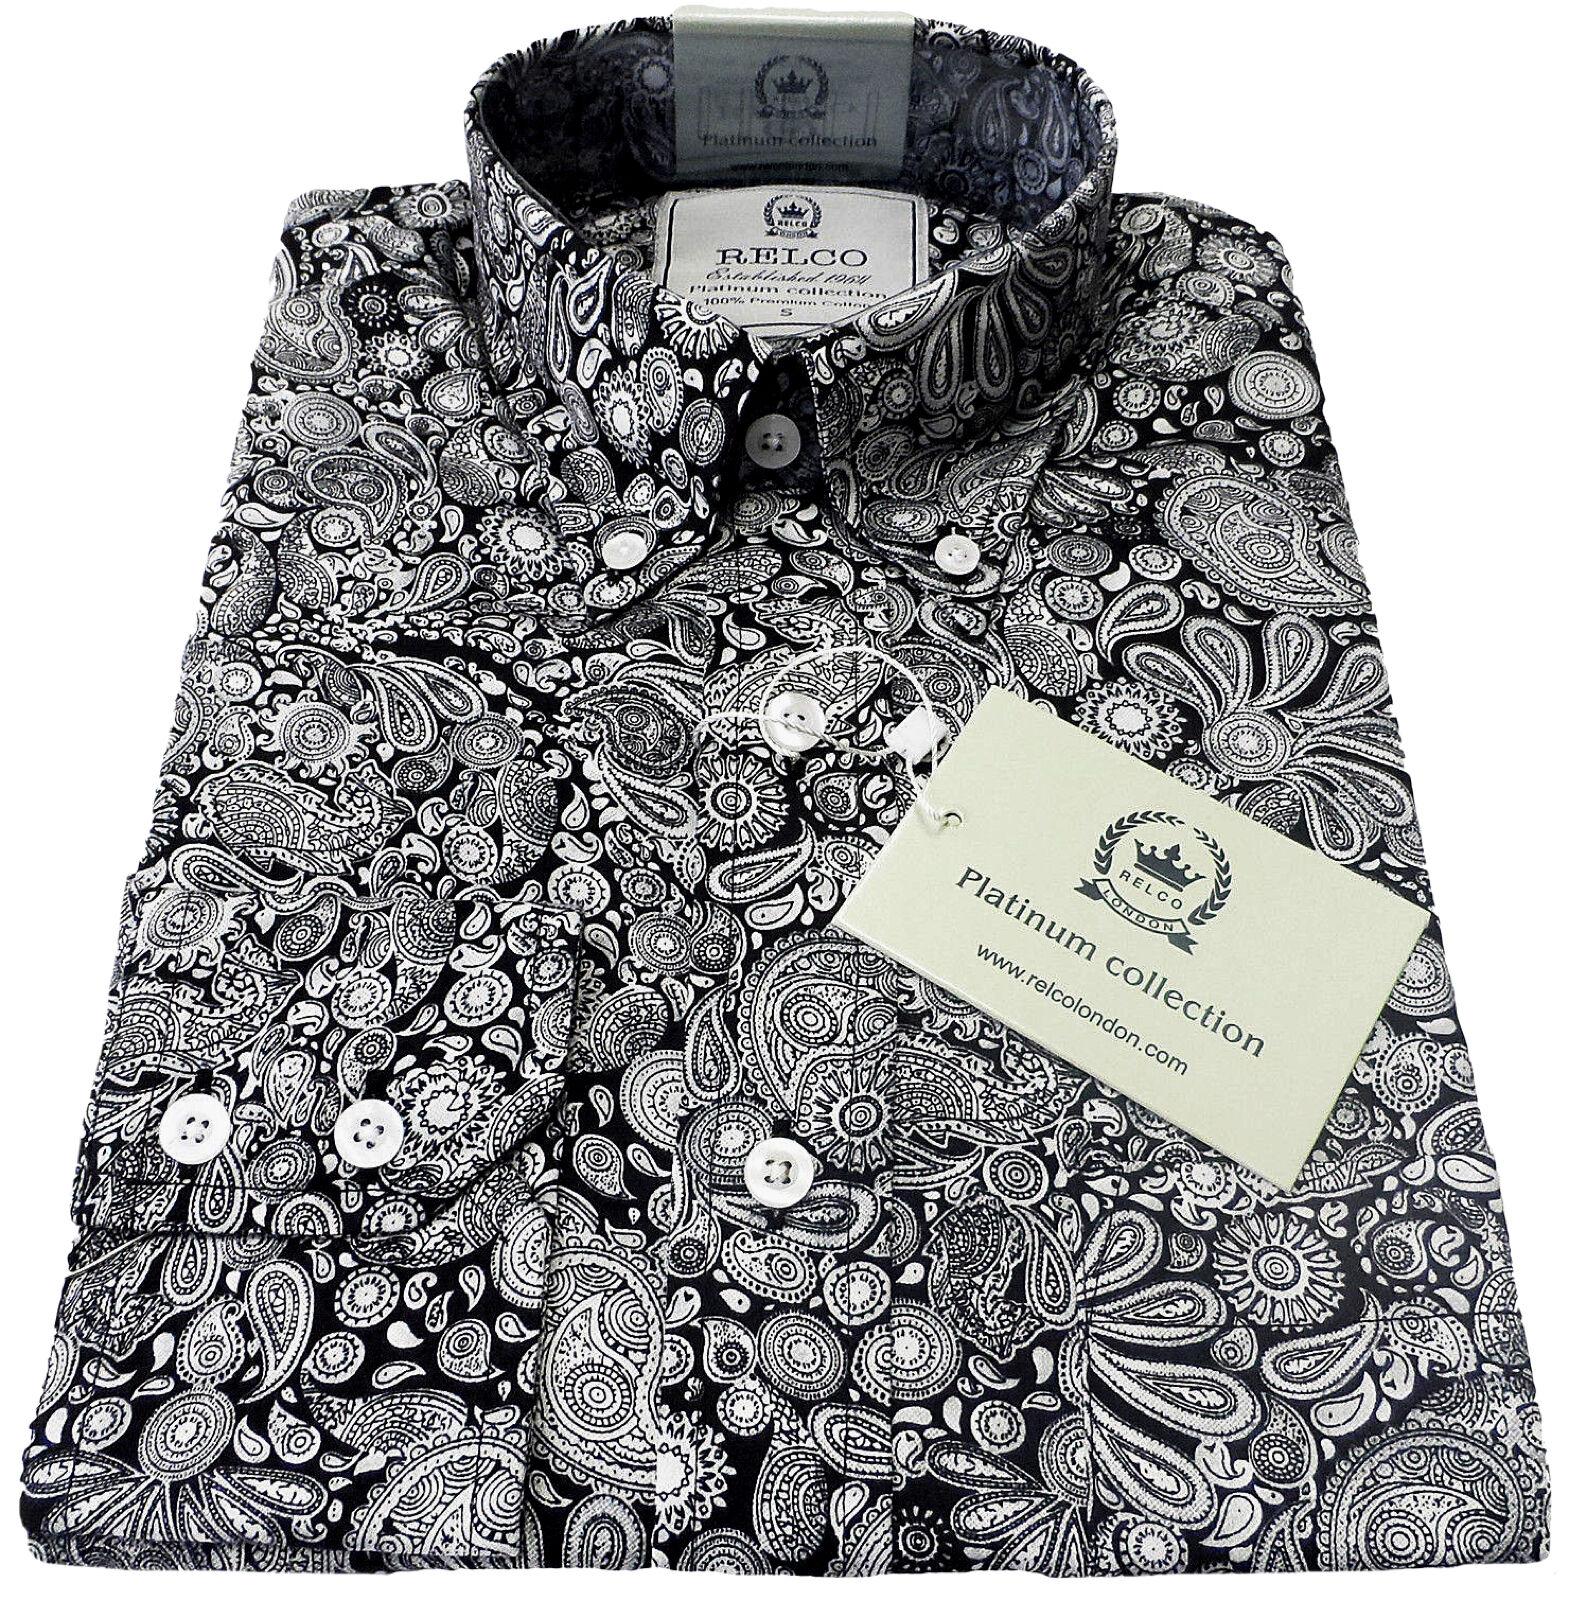 Relco Herren Paisley Hemd Platin Kollektion Langärmlig Mod Retro Vintage Schwarz  | Primäre Qualität